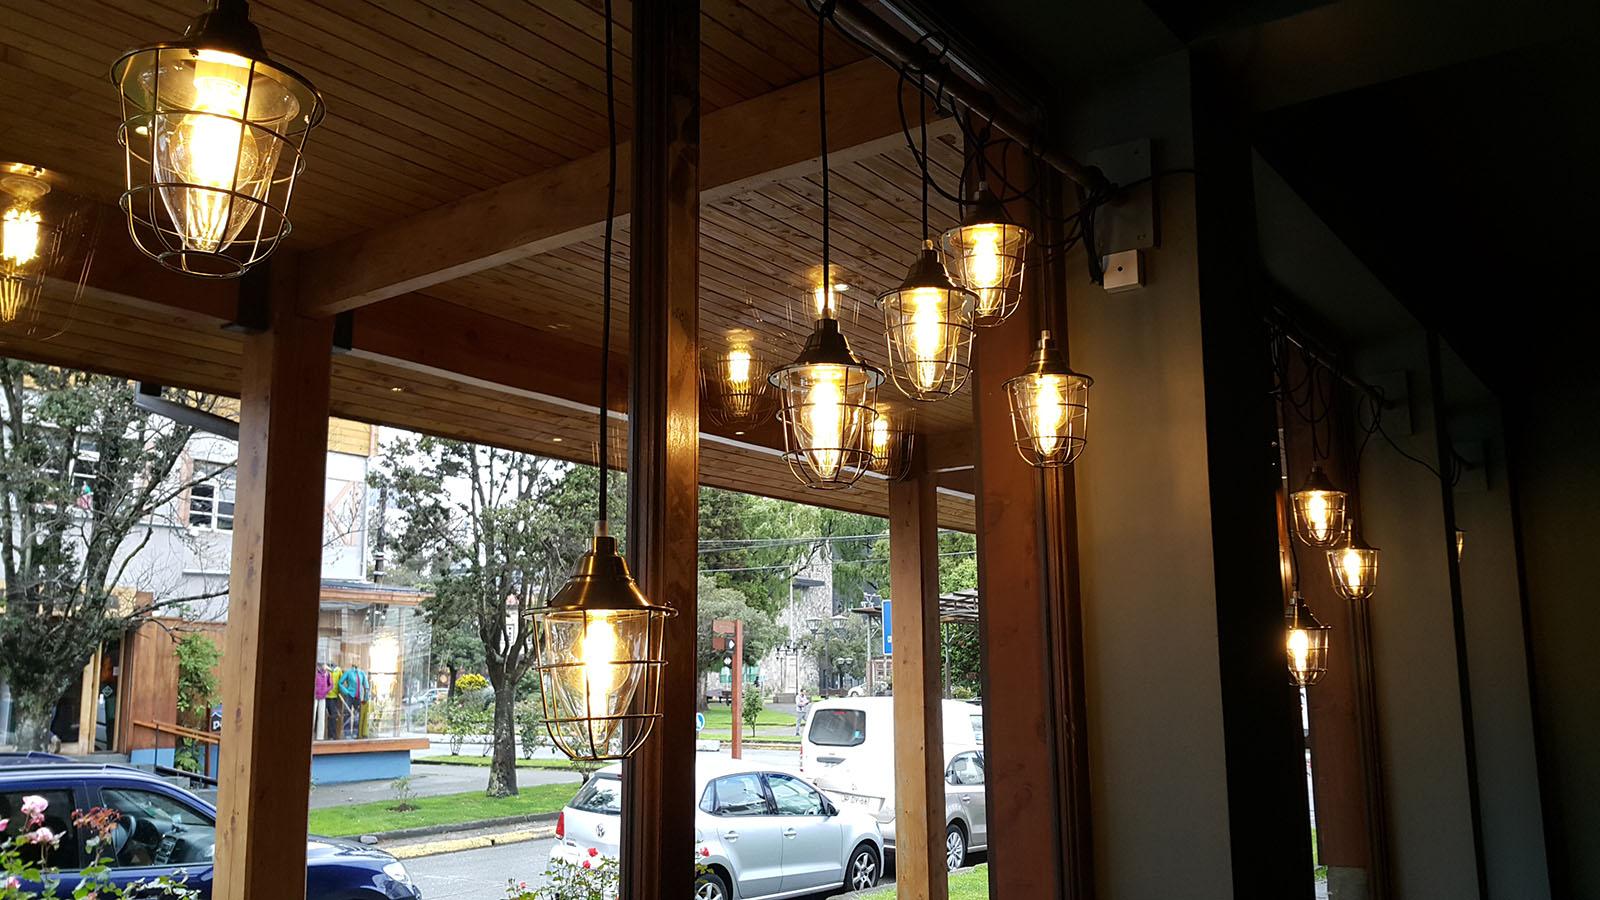 Foto de detalle de Café Hidalgo